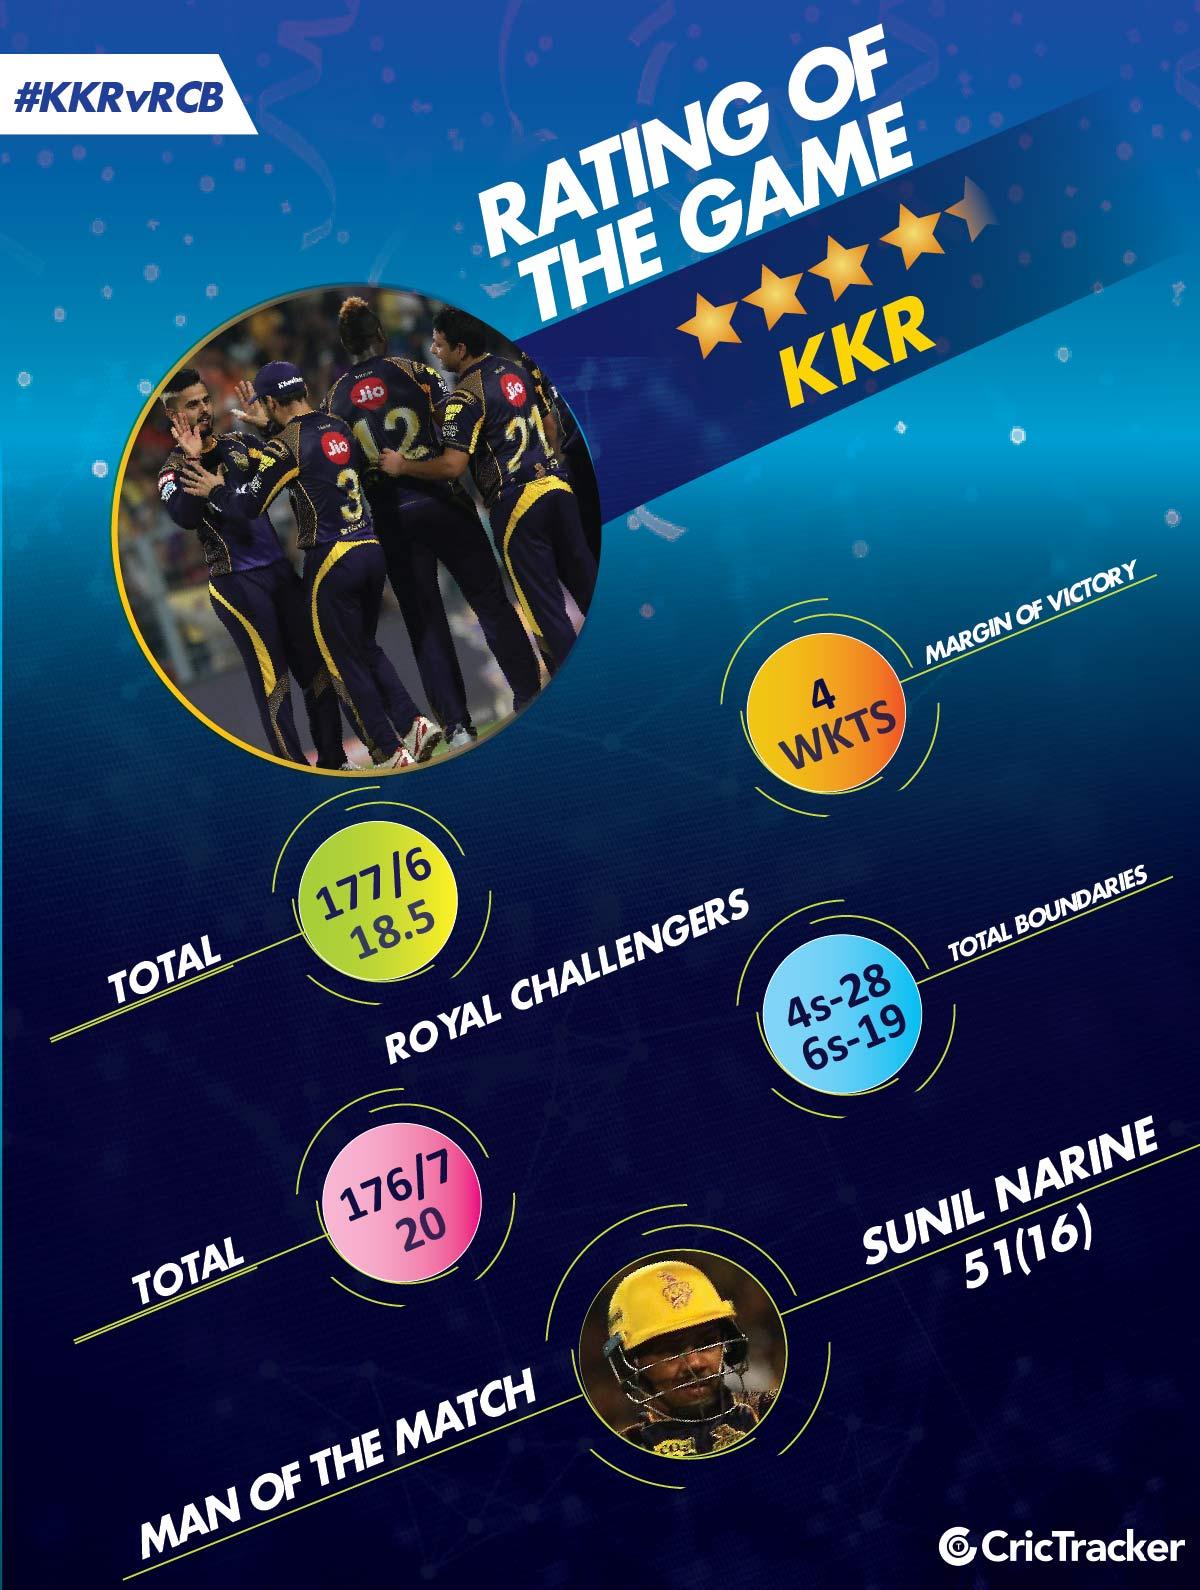 IPL2018 -kkrVrcb-Rating